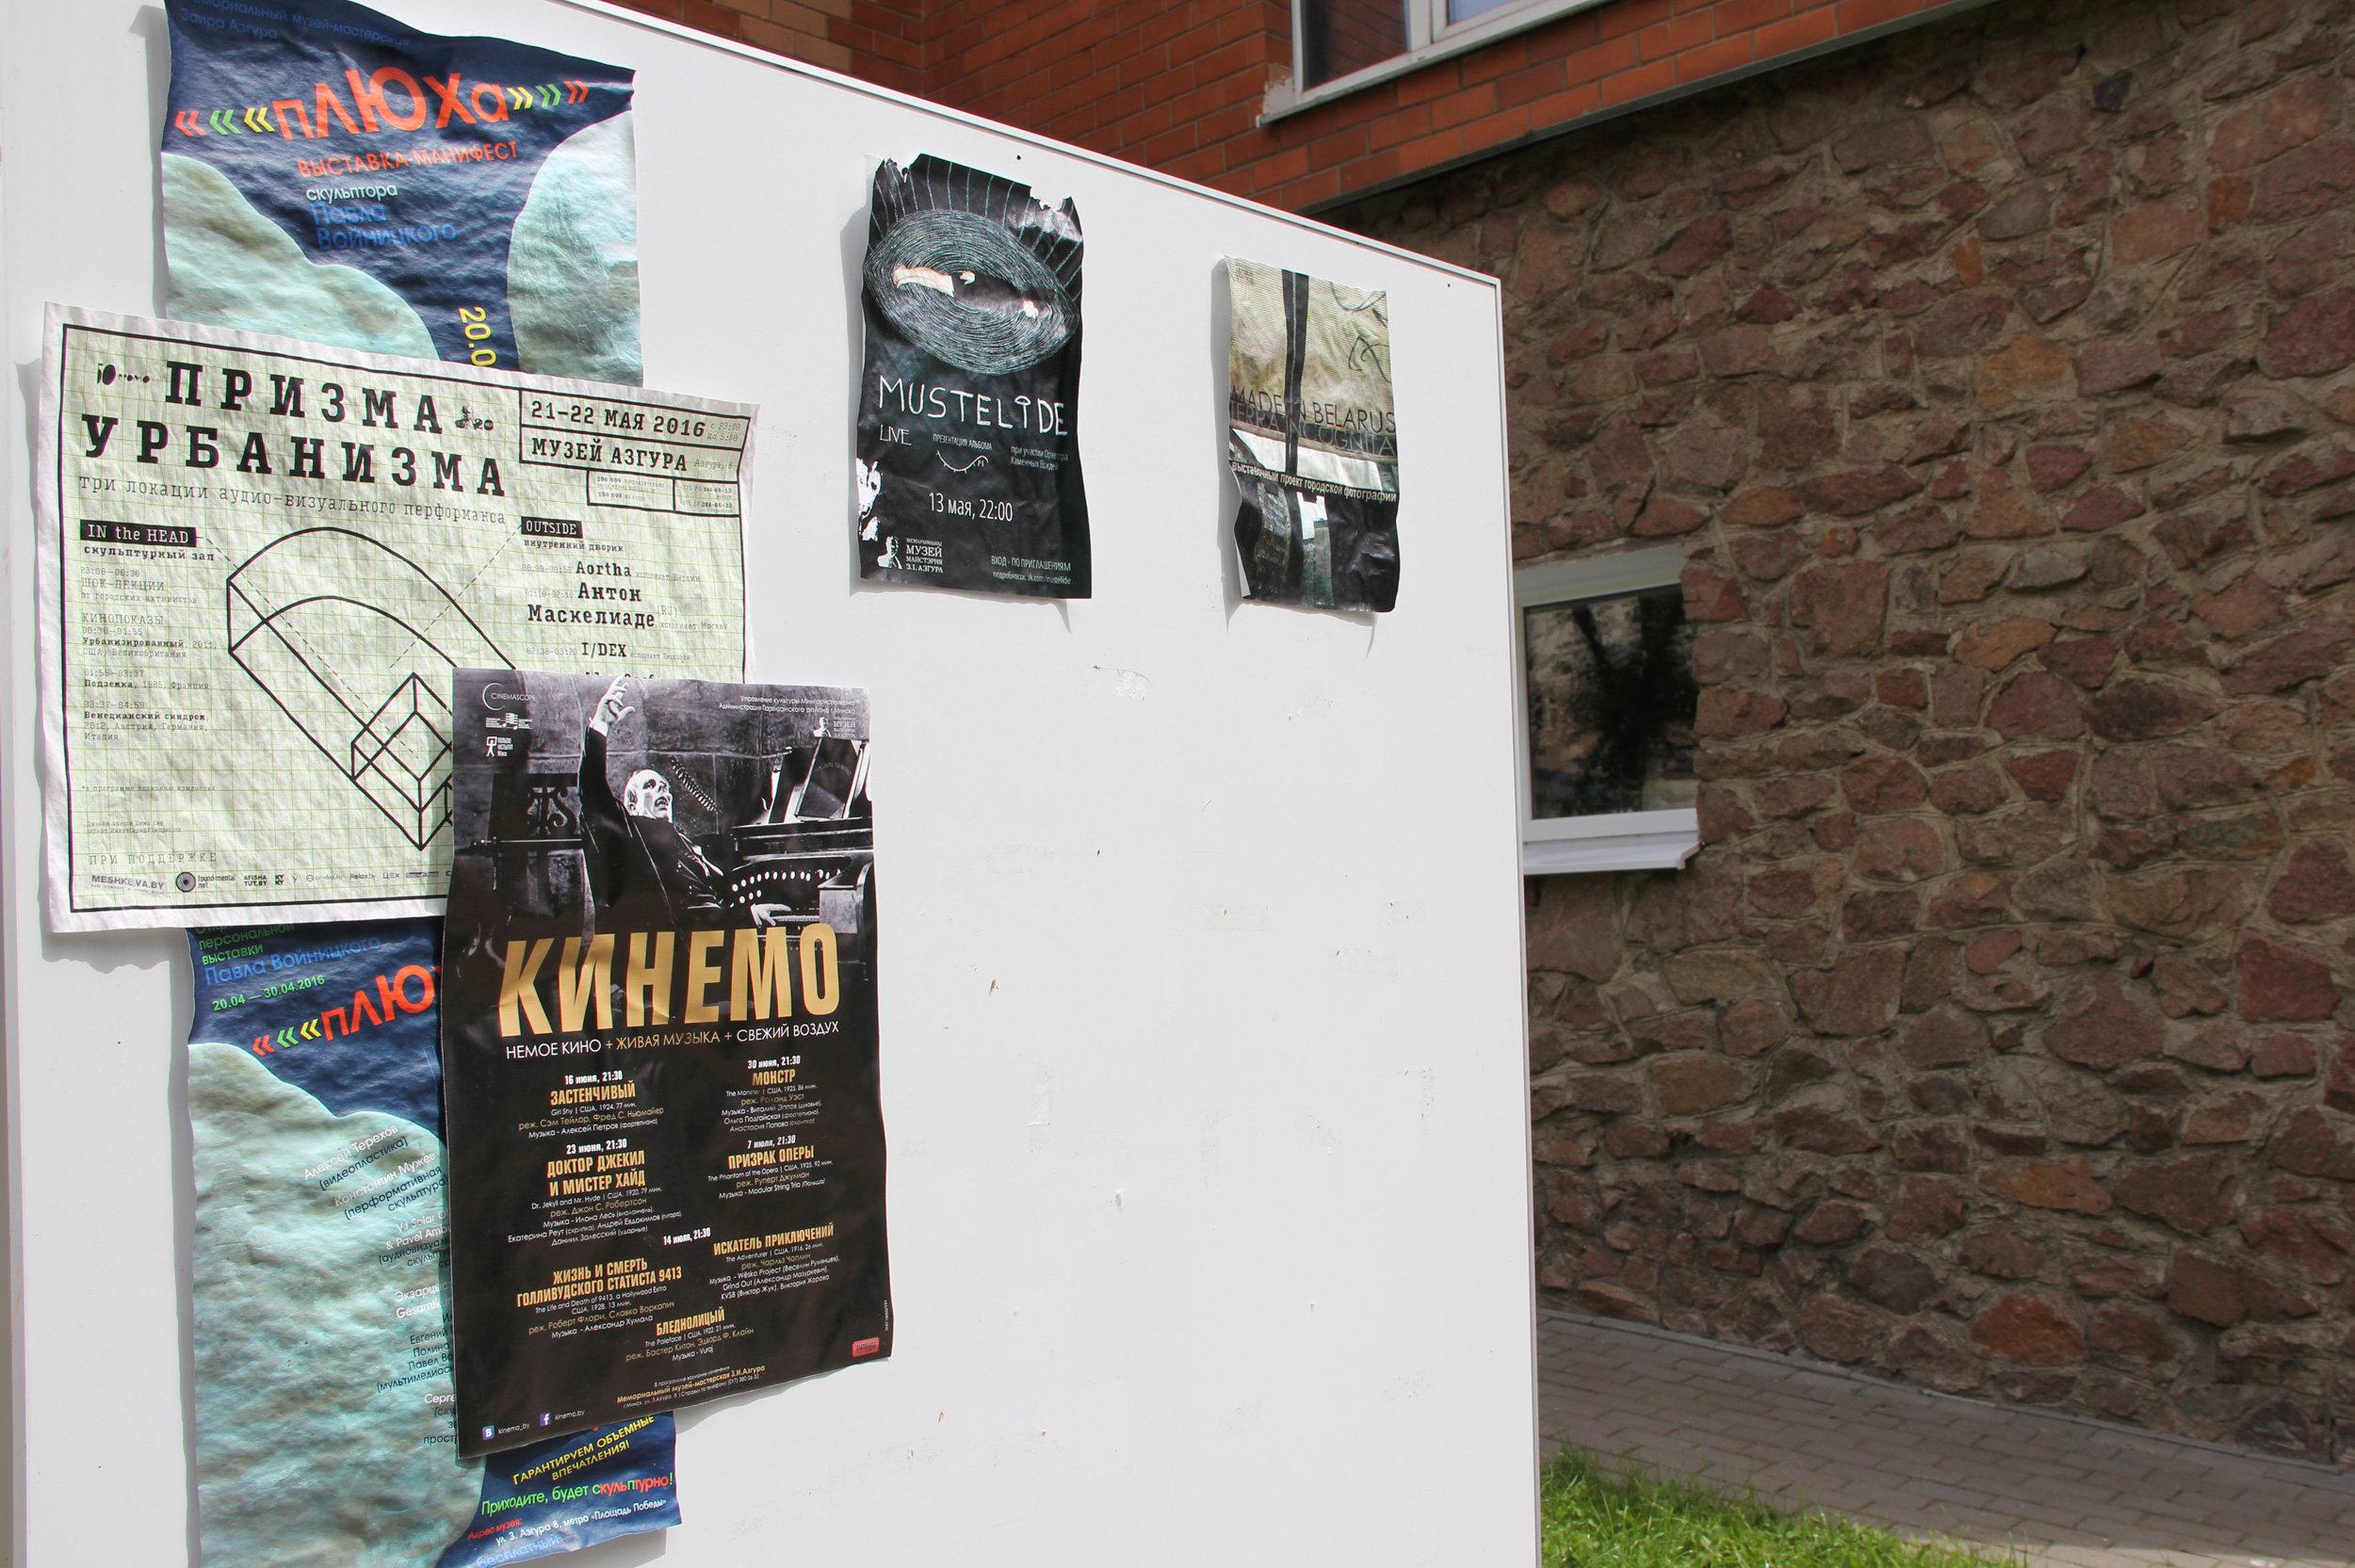 Фестиваль немого кино Кинемо